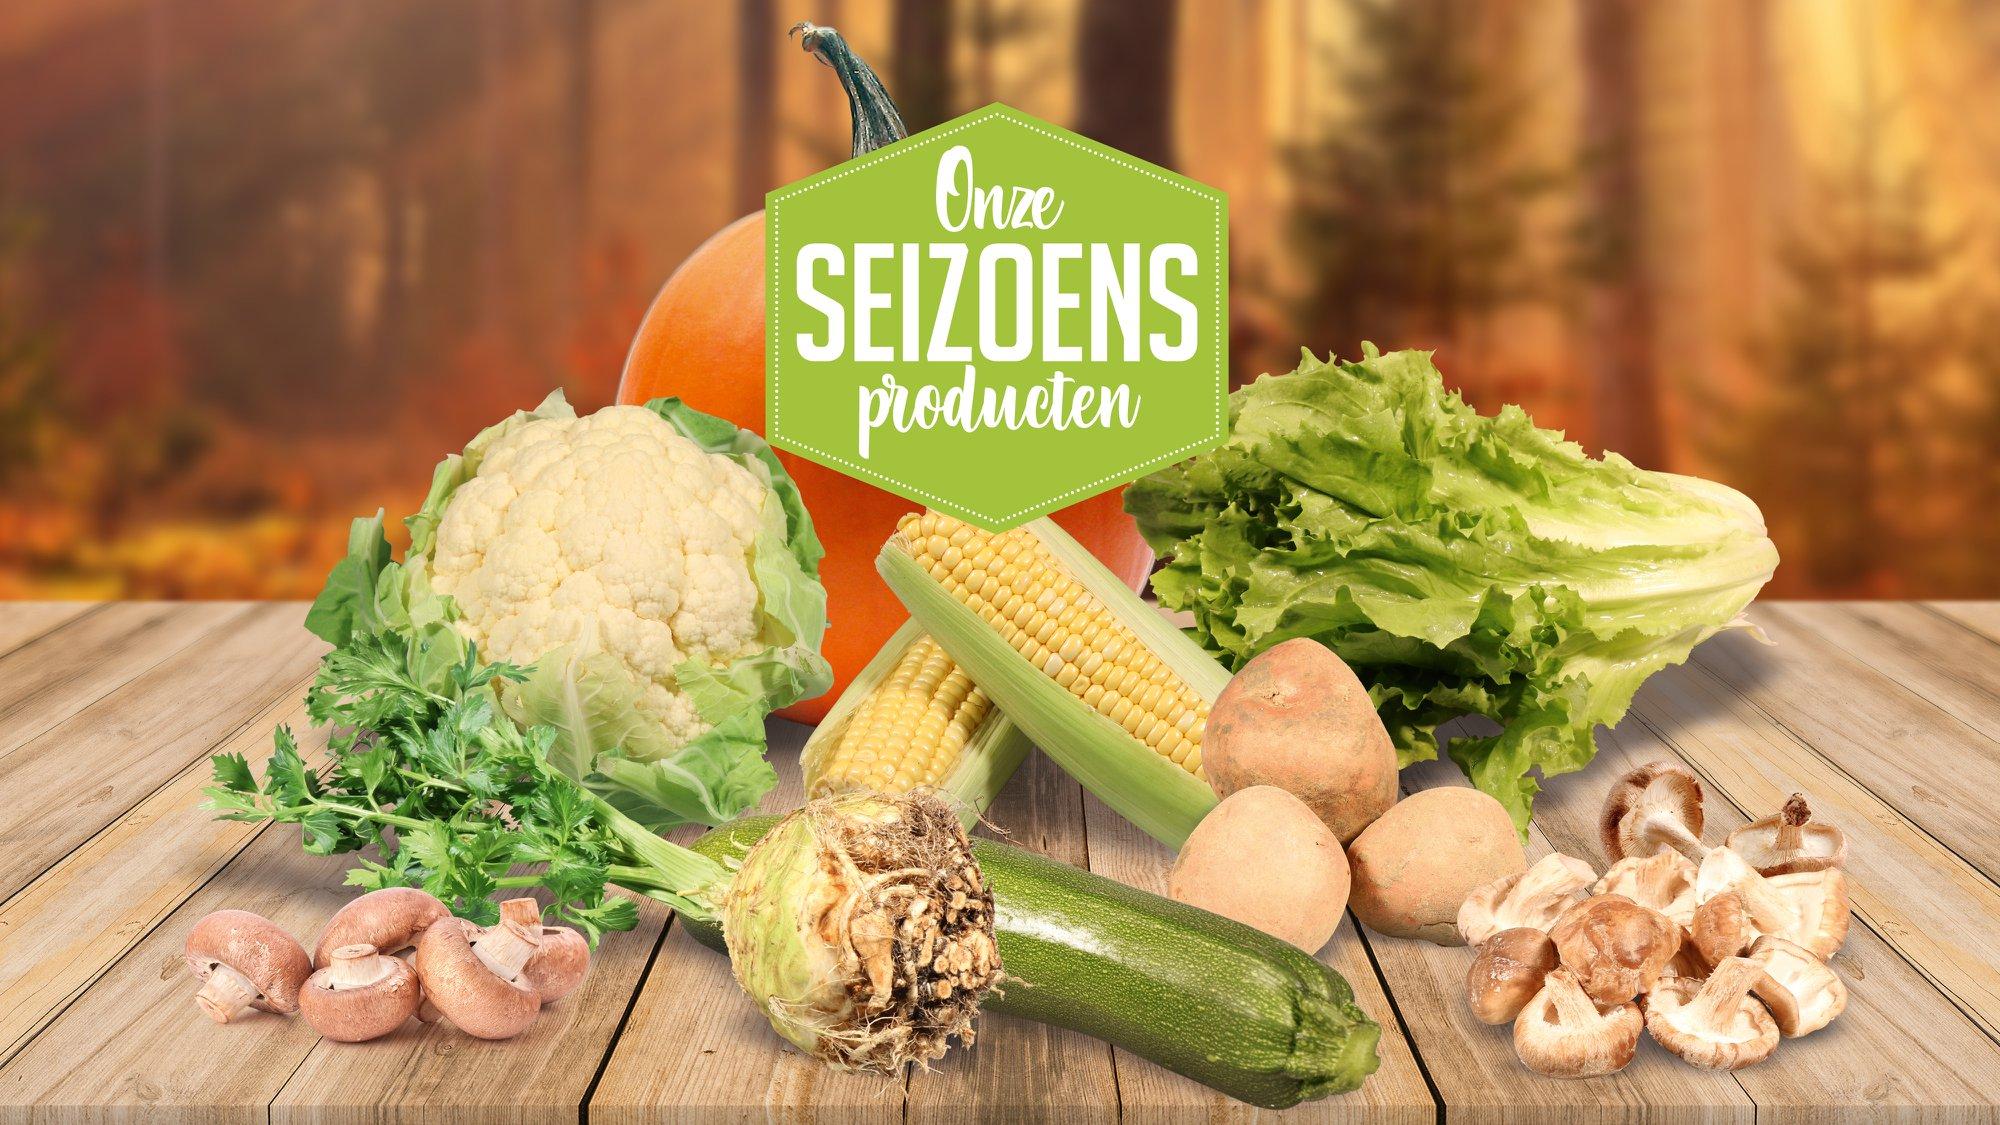 Seizoen groente augustus